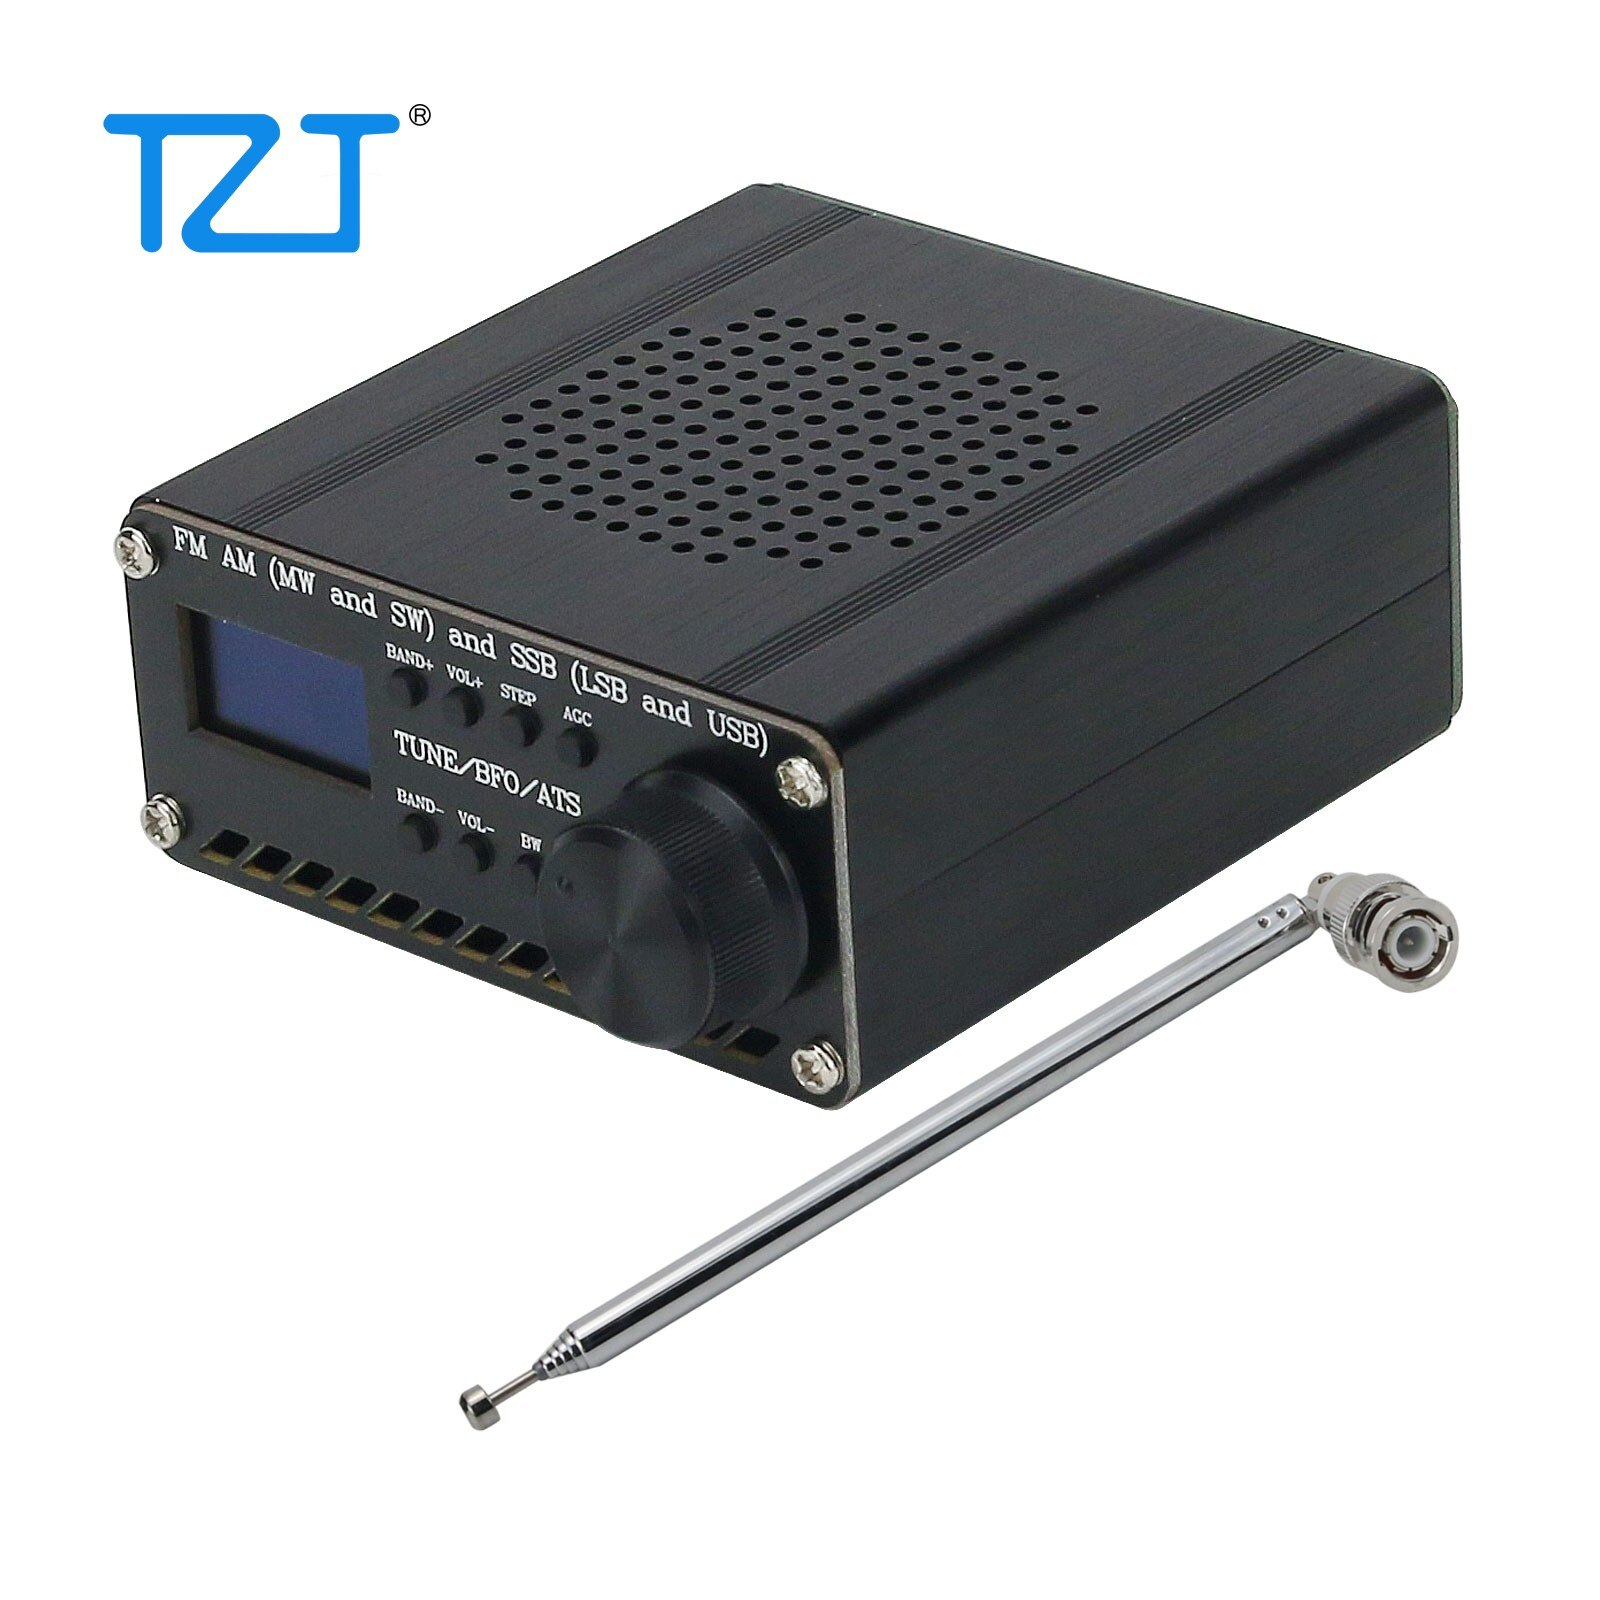 Assembled SI4735 SI4732 All Band Radio Receiver FM AM (MW & SW) SSB (LSB & USB) with lithium battery